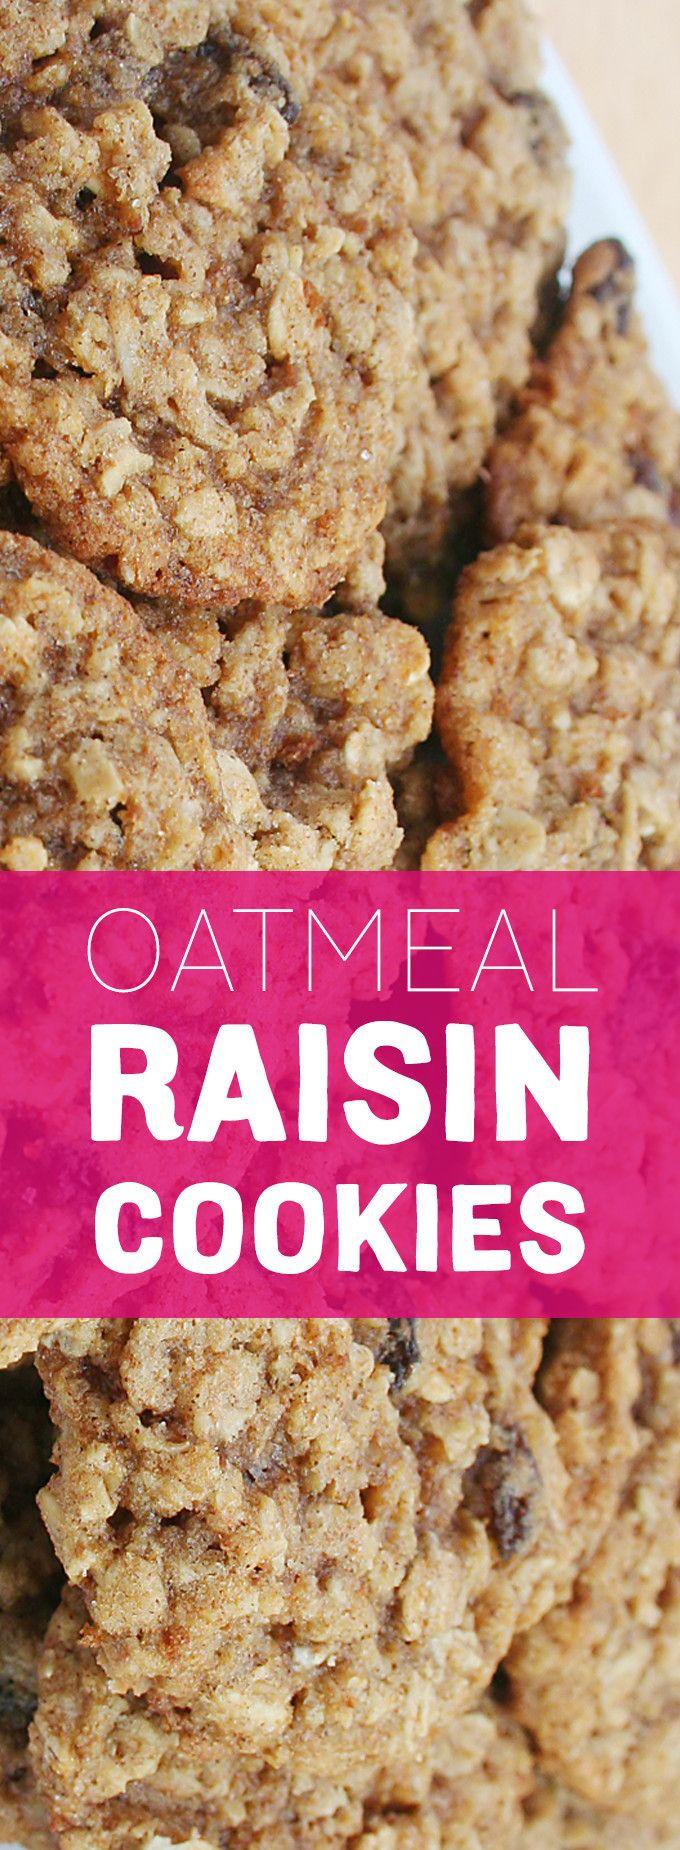 oatmeal raisin cookies oatmeal raisins snack recipes baking recipes ...